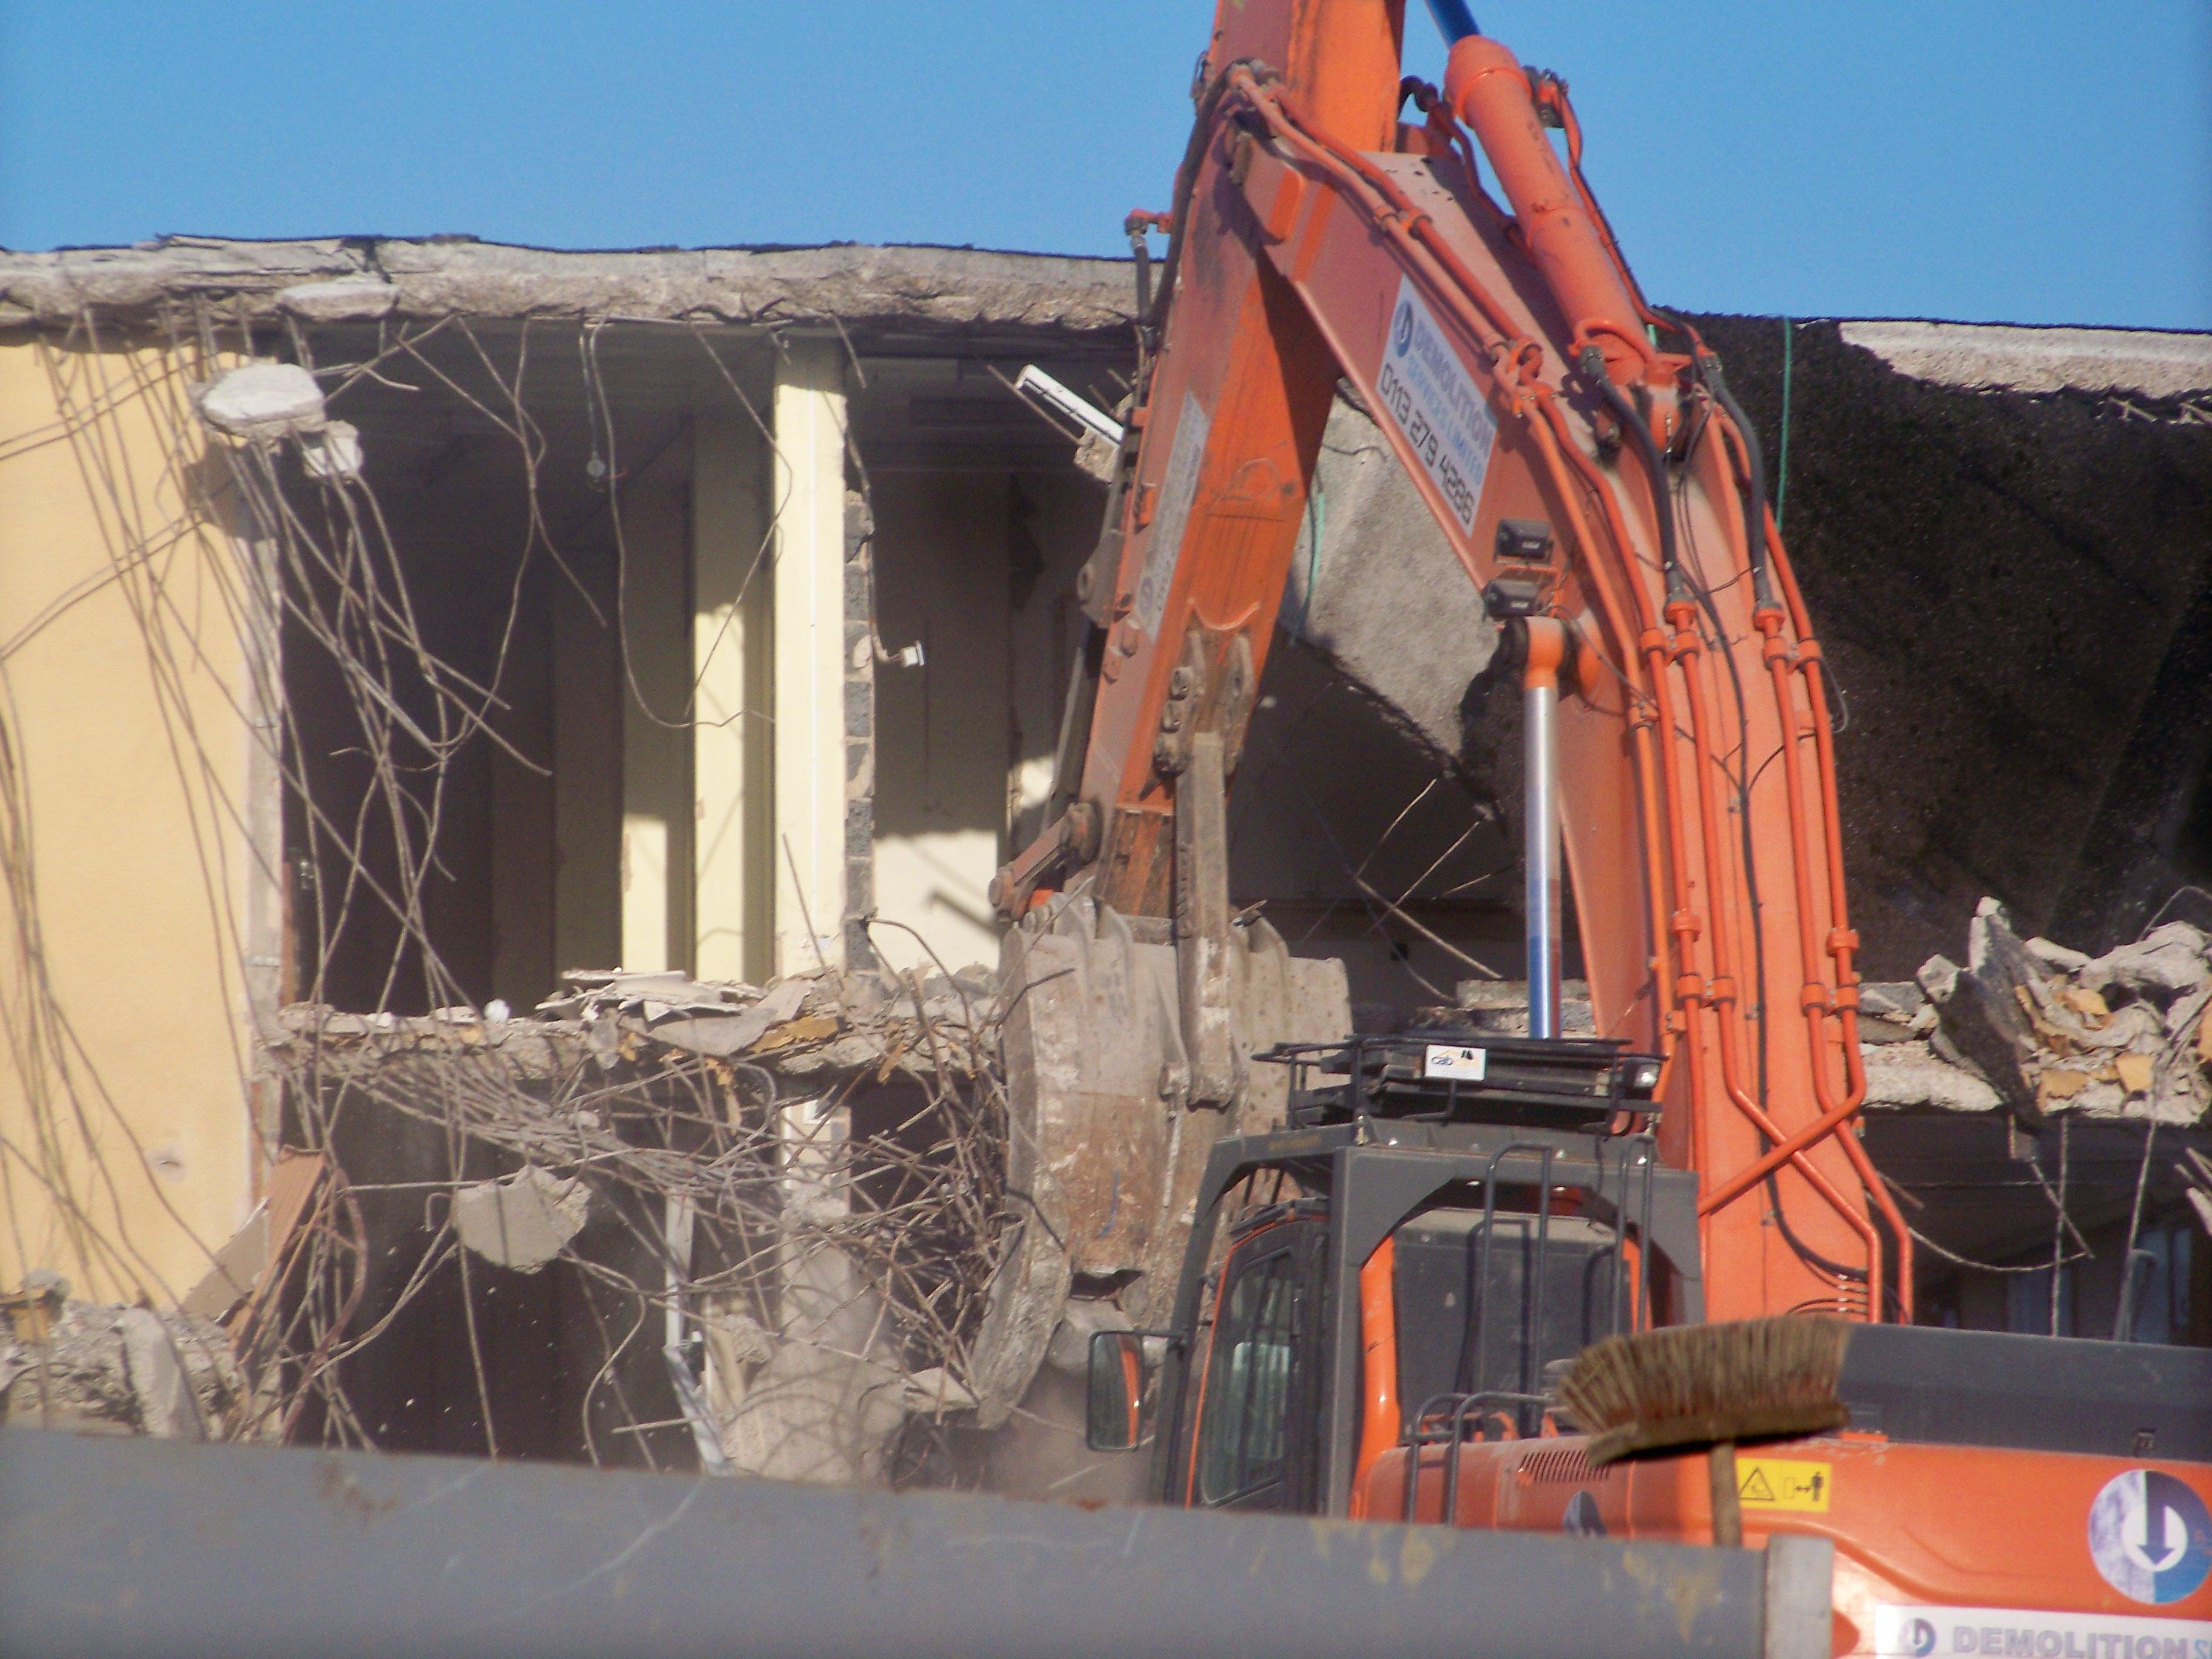 Demolition Shears